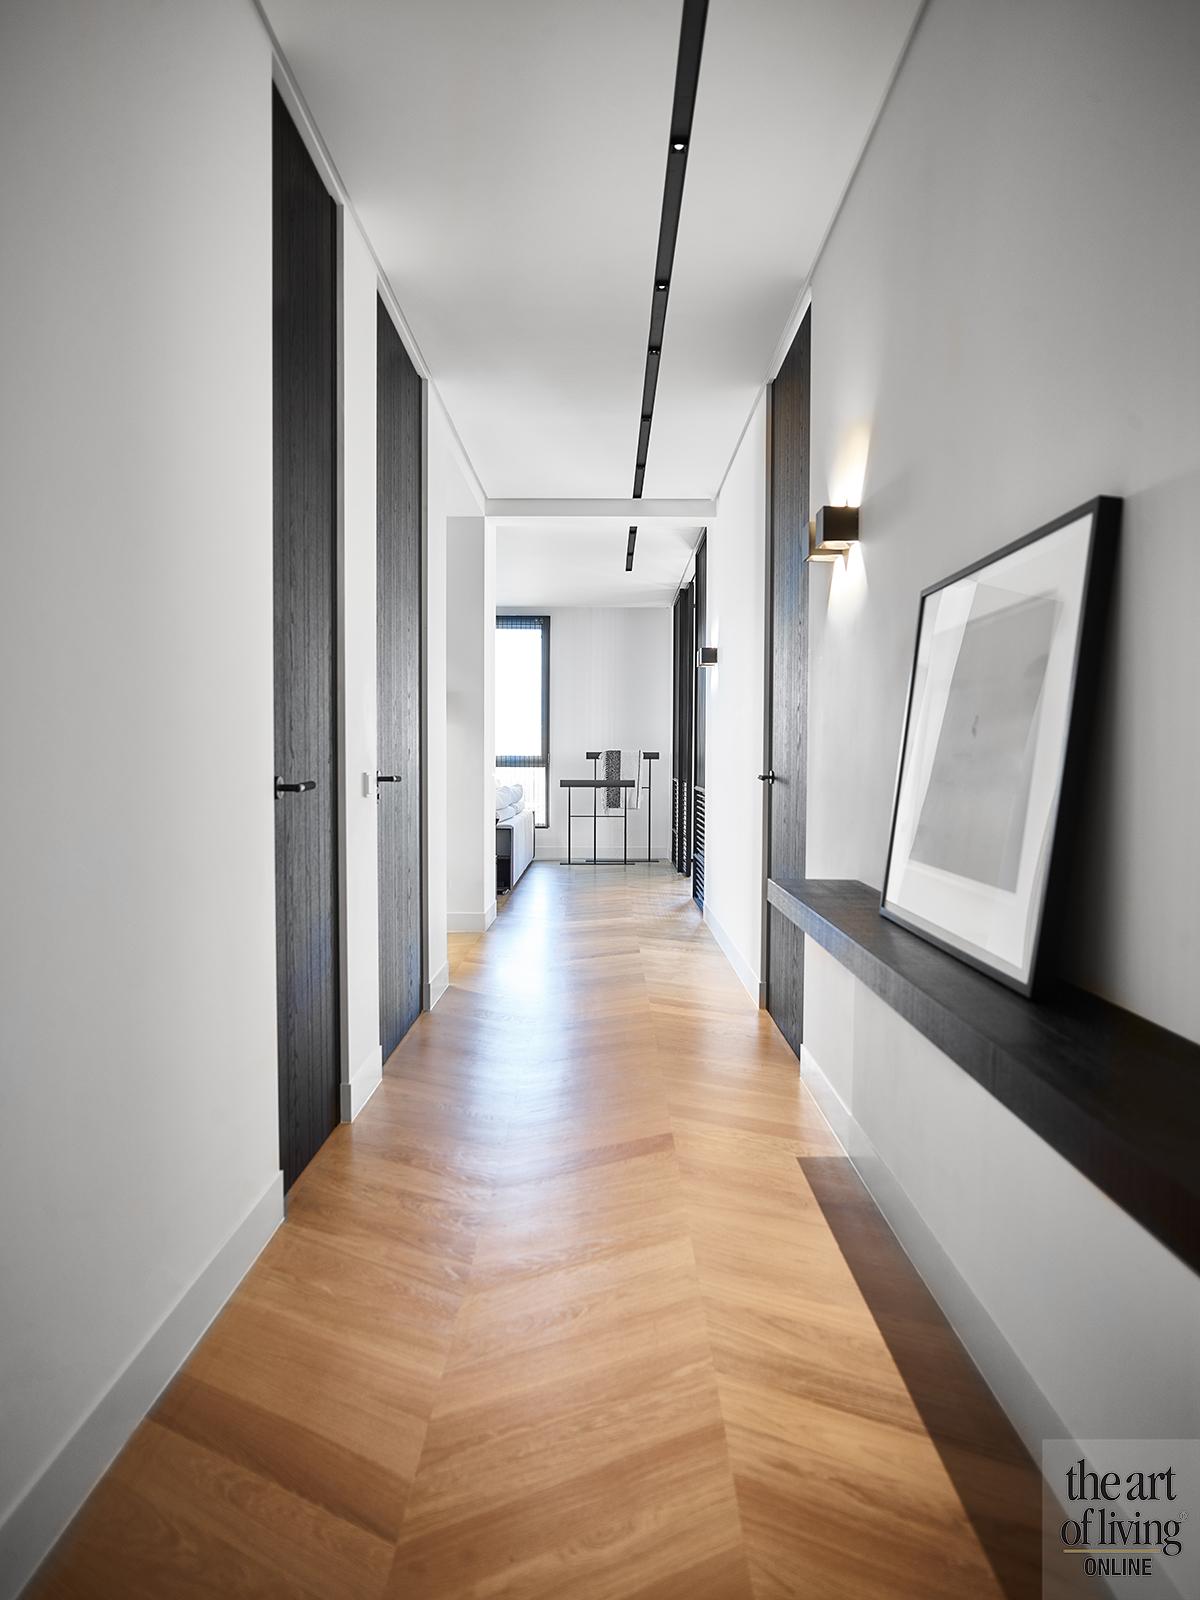 marmeren badkamer, Grand & Johnson, luxe, marmer, donkere keuken, exclusief, high end materialen